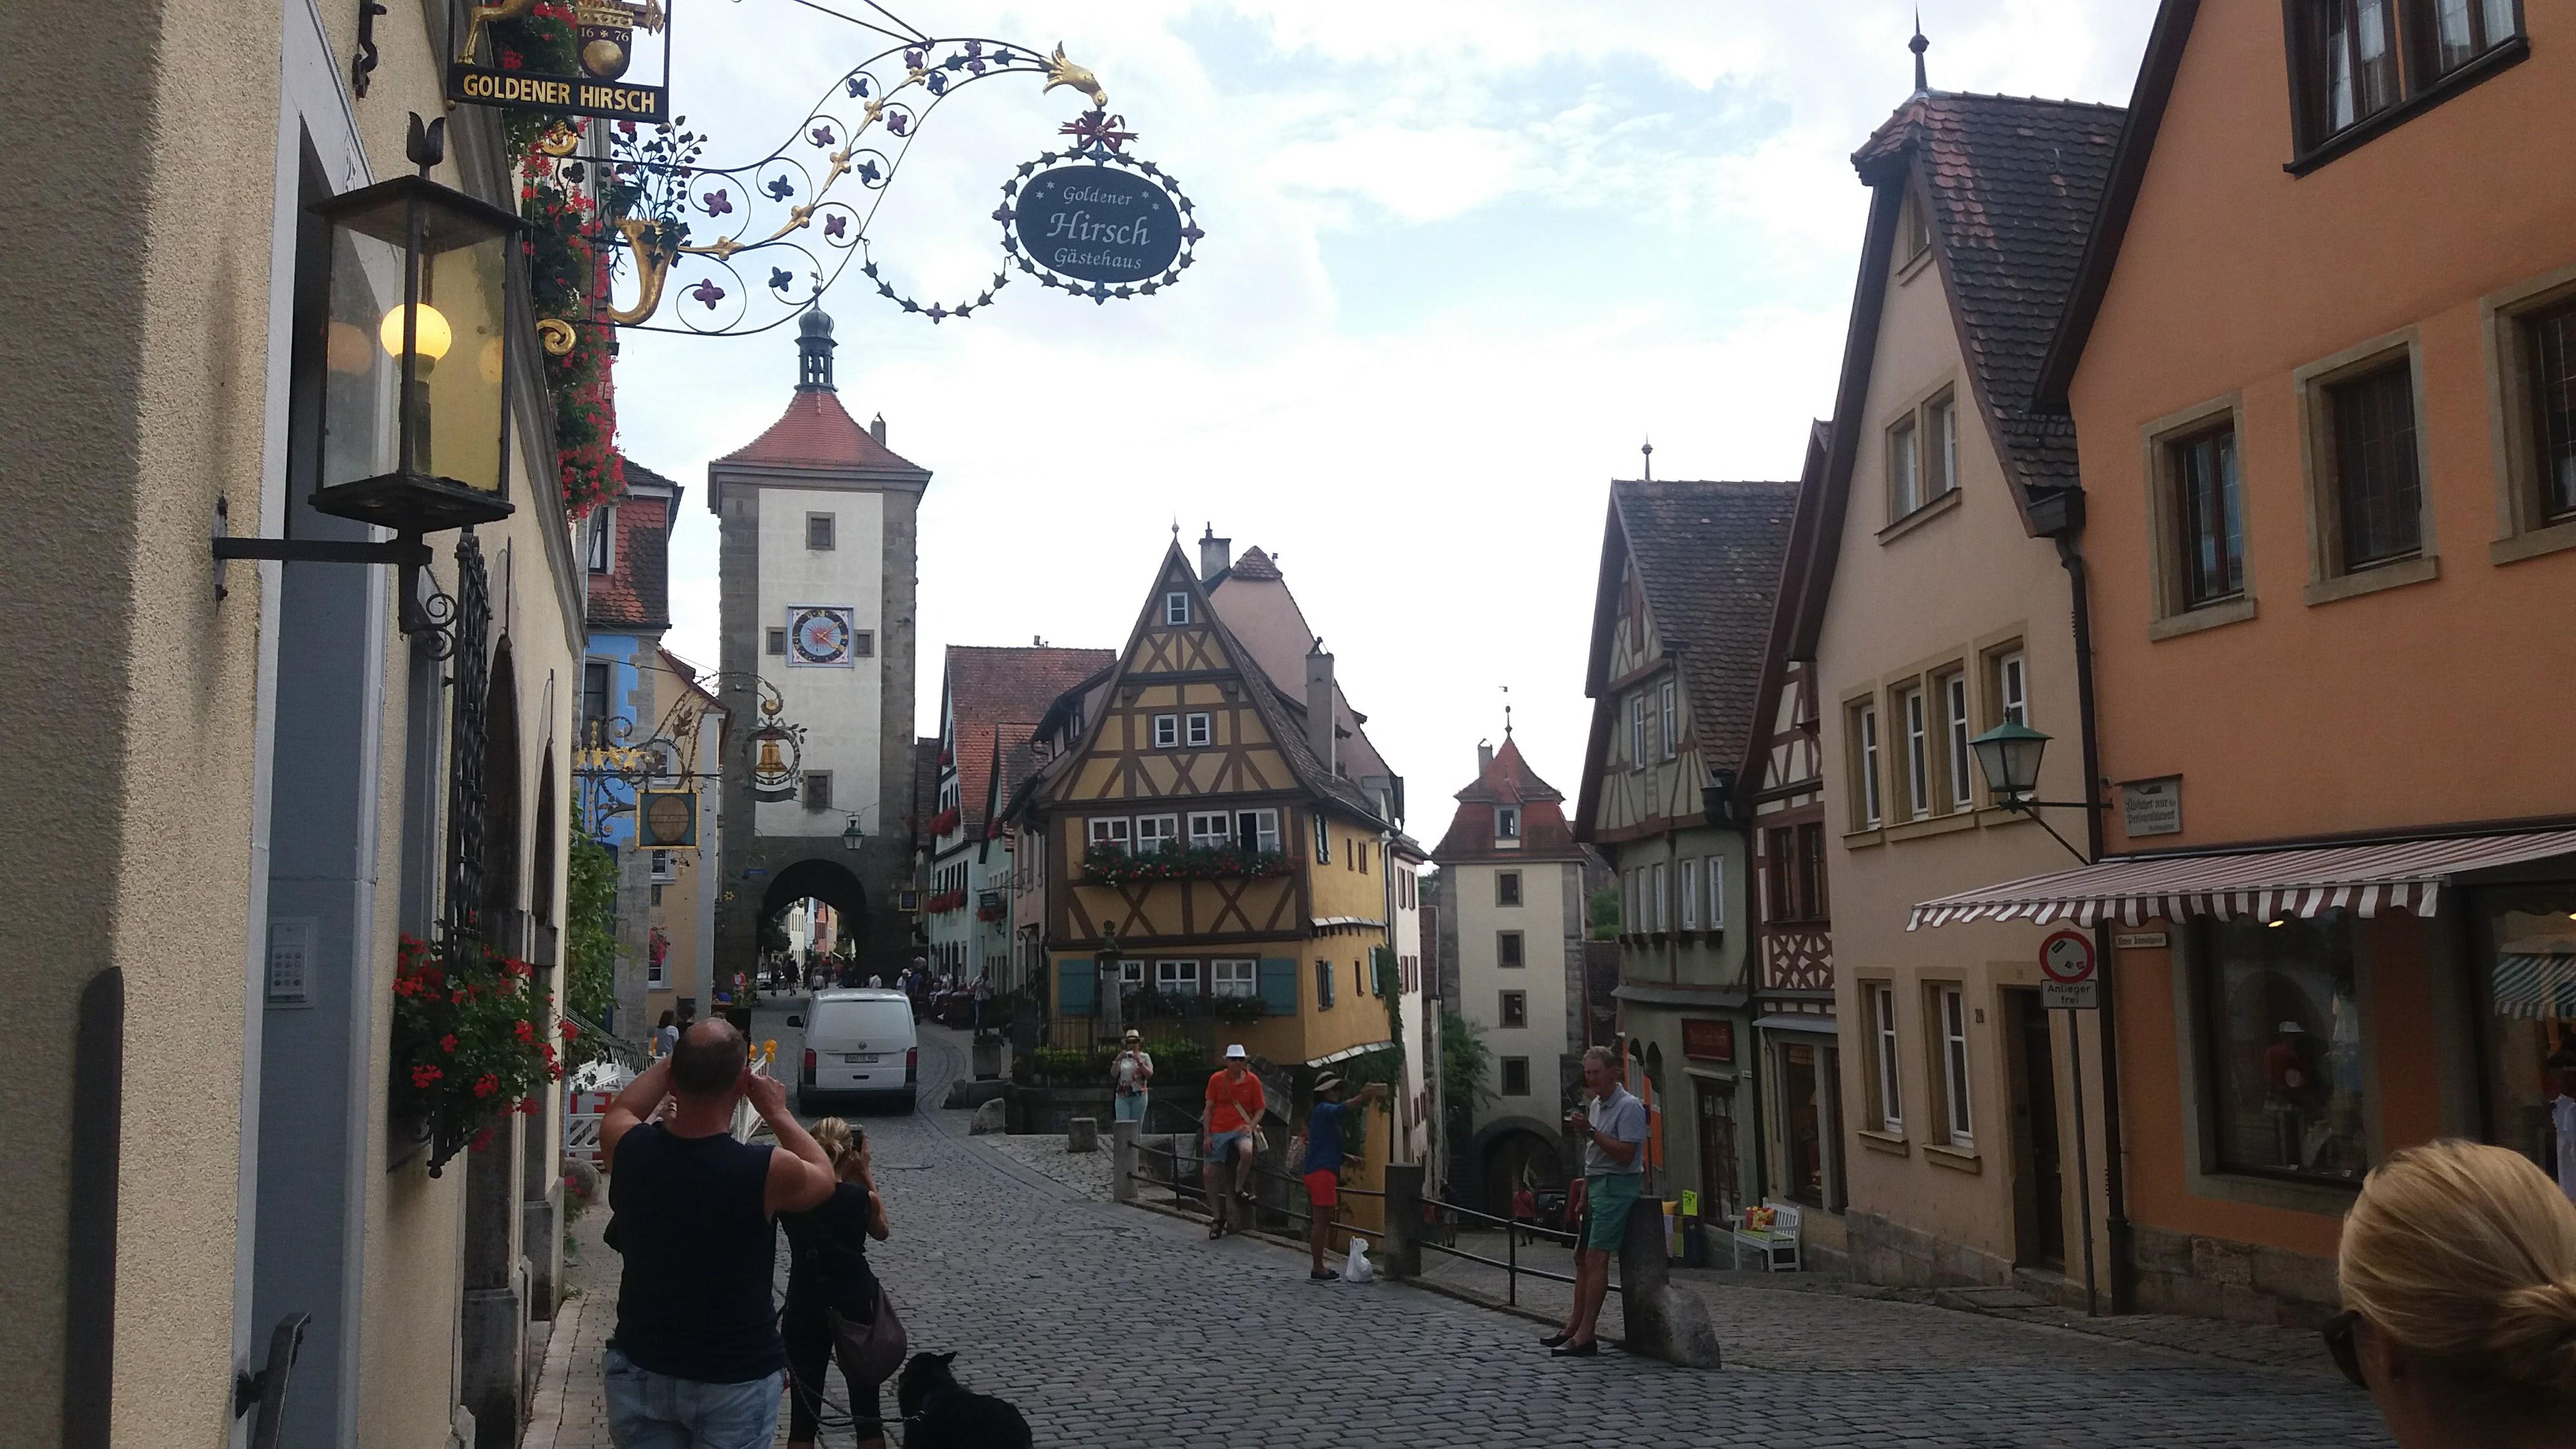 Um dia em Rothenburg ob der Tauber